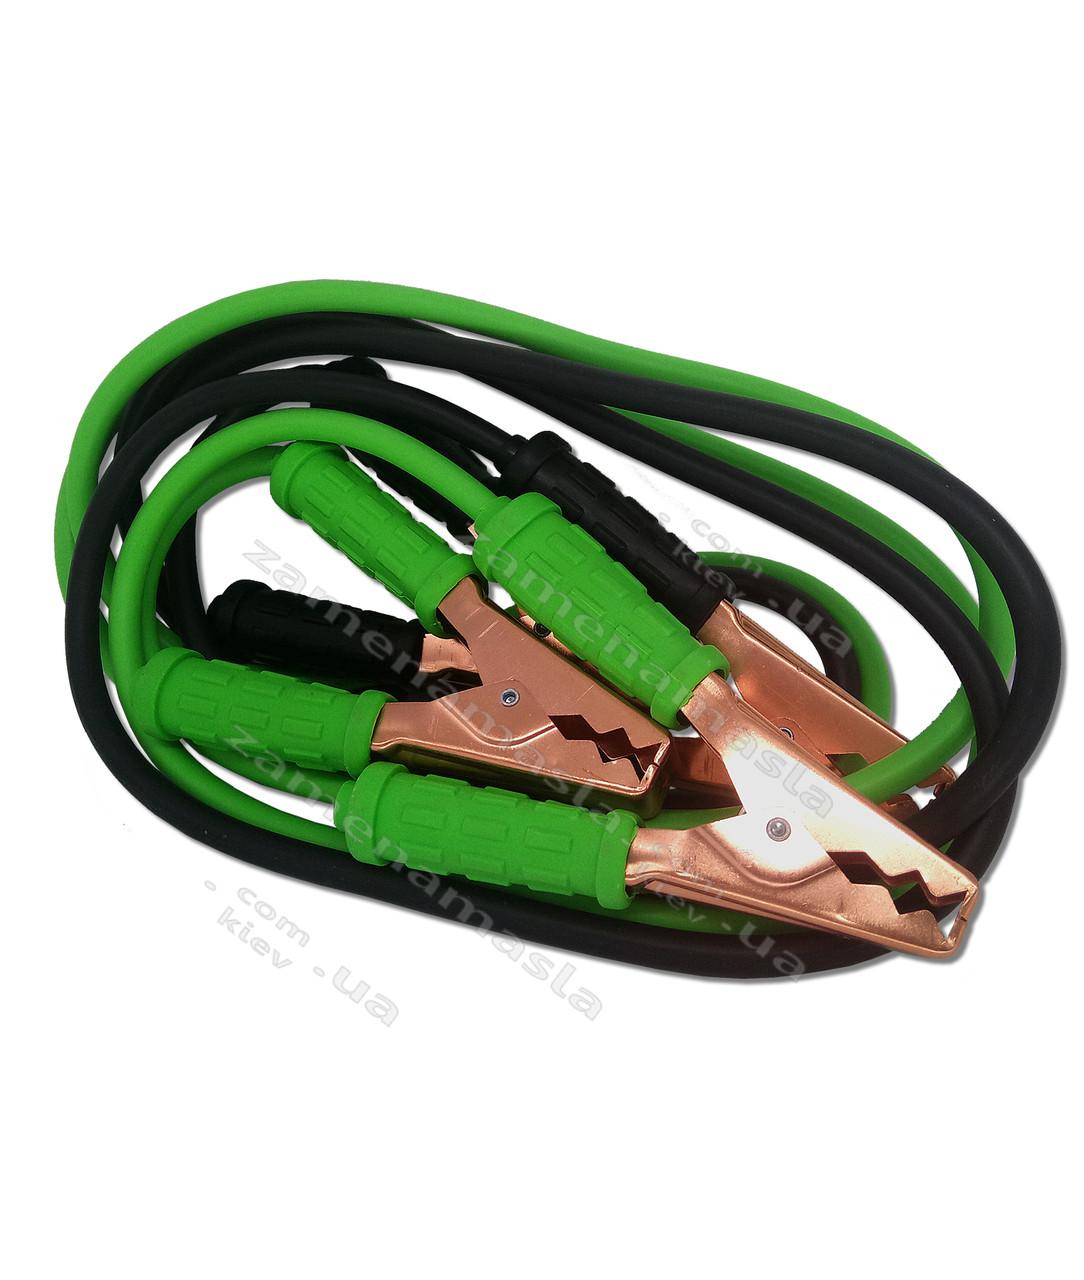 Winso - провода прикуриватели  400А, 2.5М